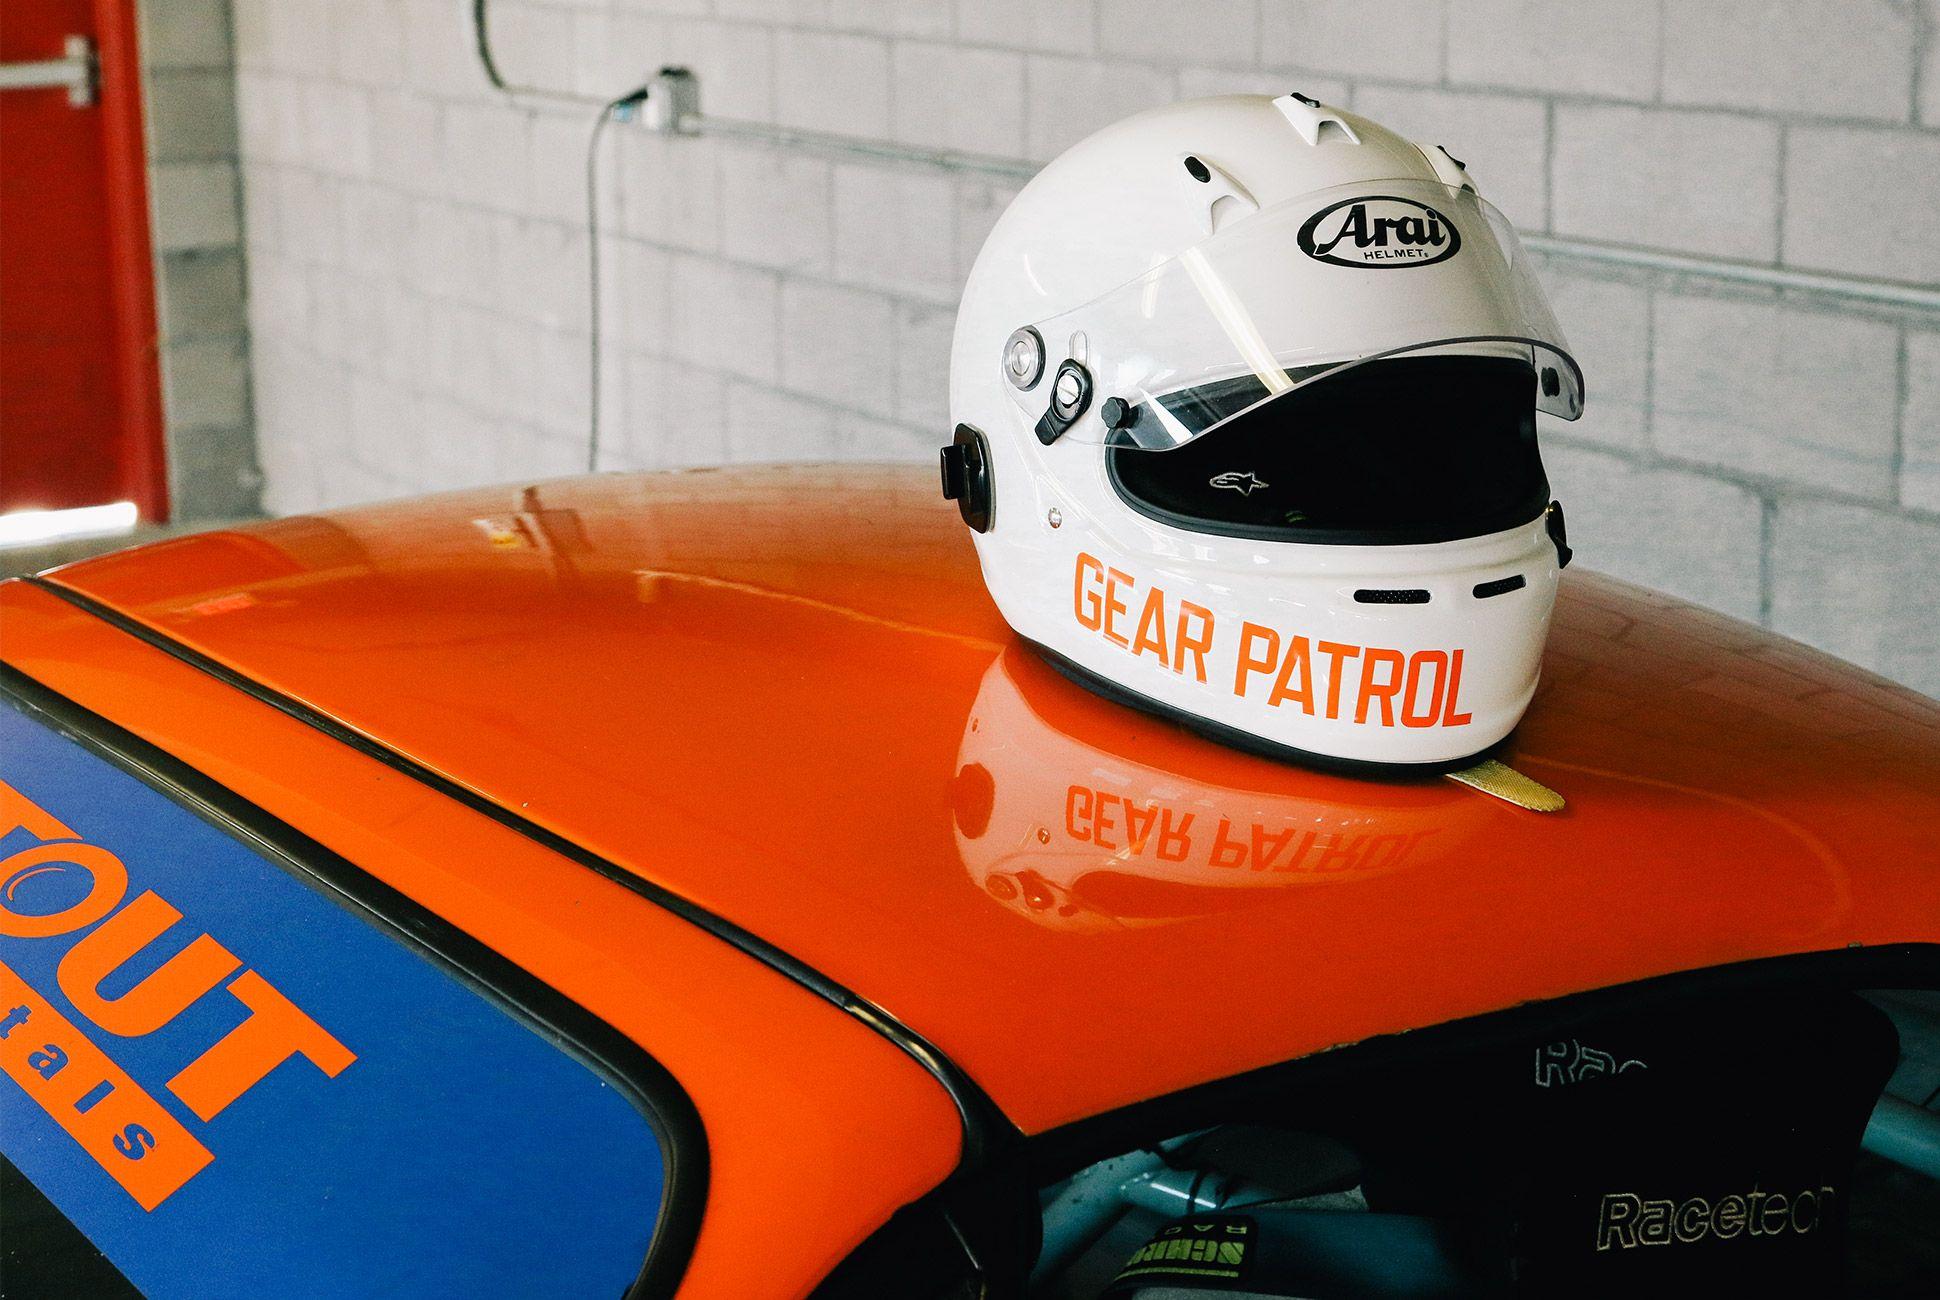 Mazda-Miata-The-Best-Vintage-Sportscar-gear-patrol-4